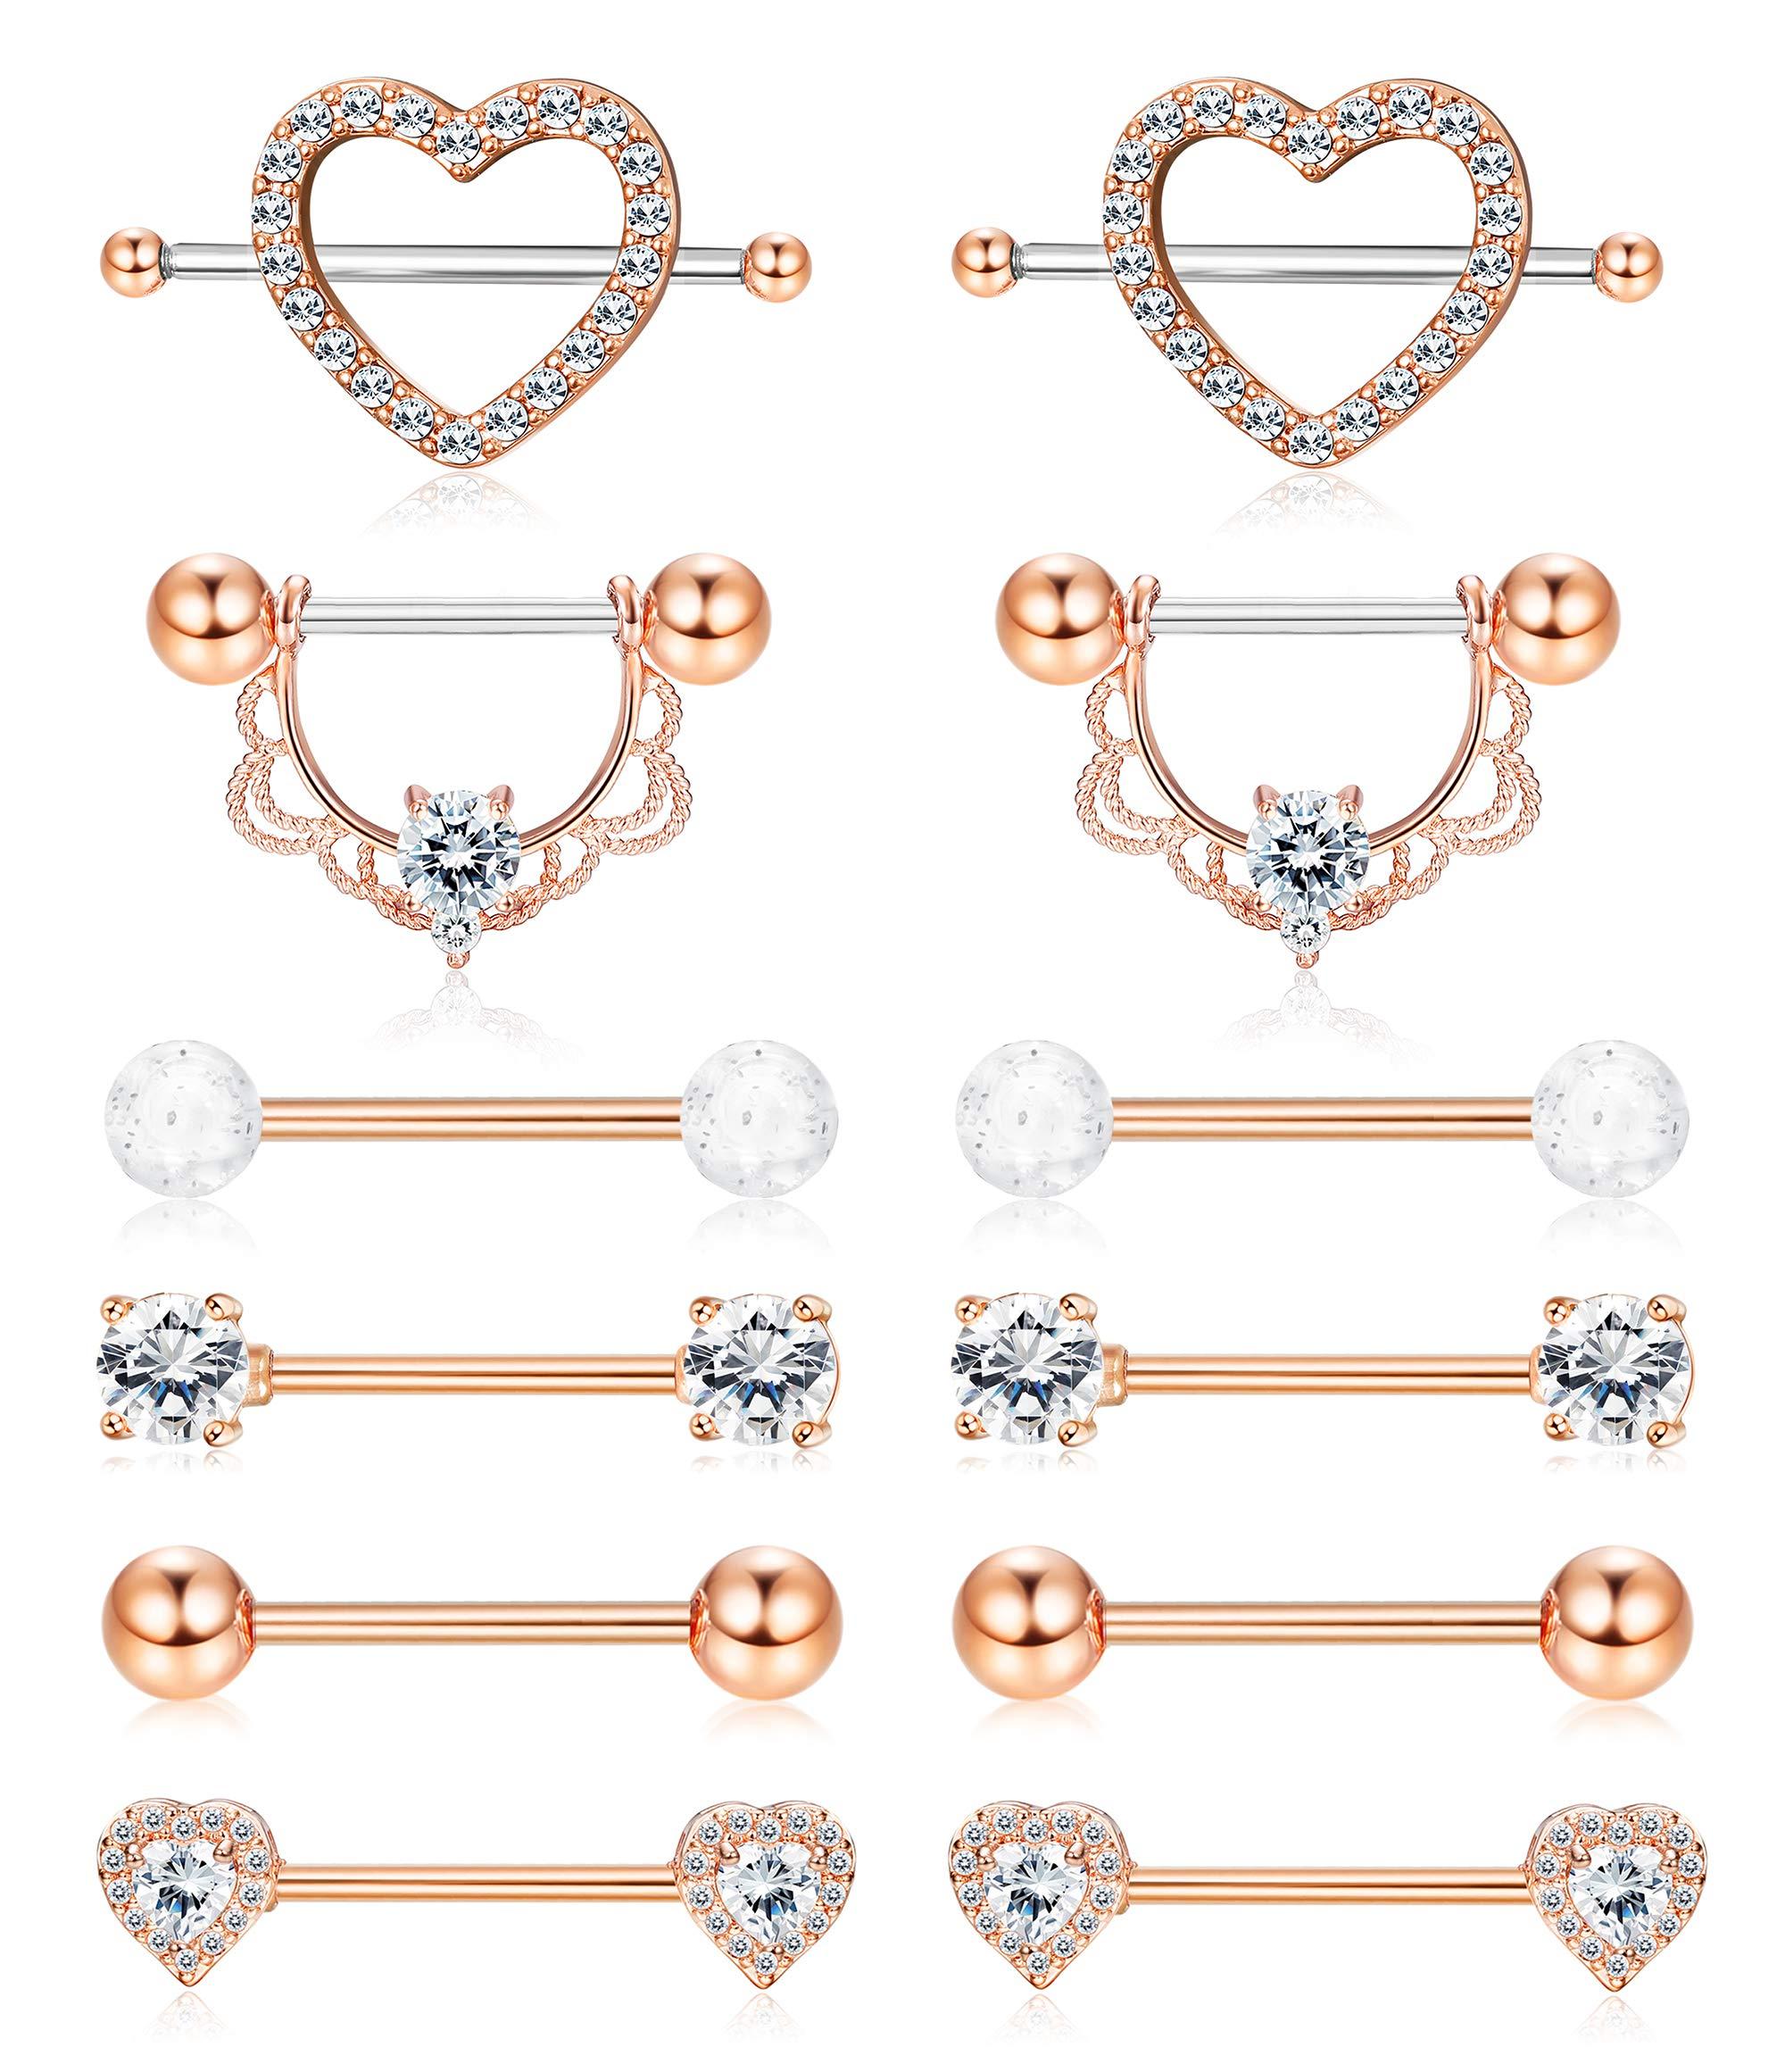 ORAZIO 14G Nipplerings Piercing Women Stainless Steel CZ Nipple Rings Jewelry Rose Gold Tone by ORAZIO